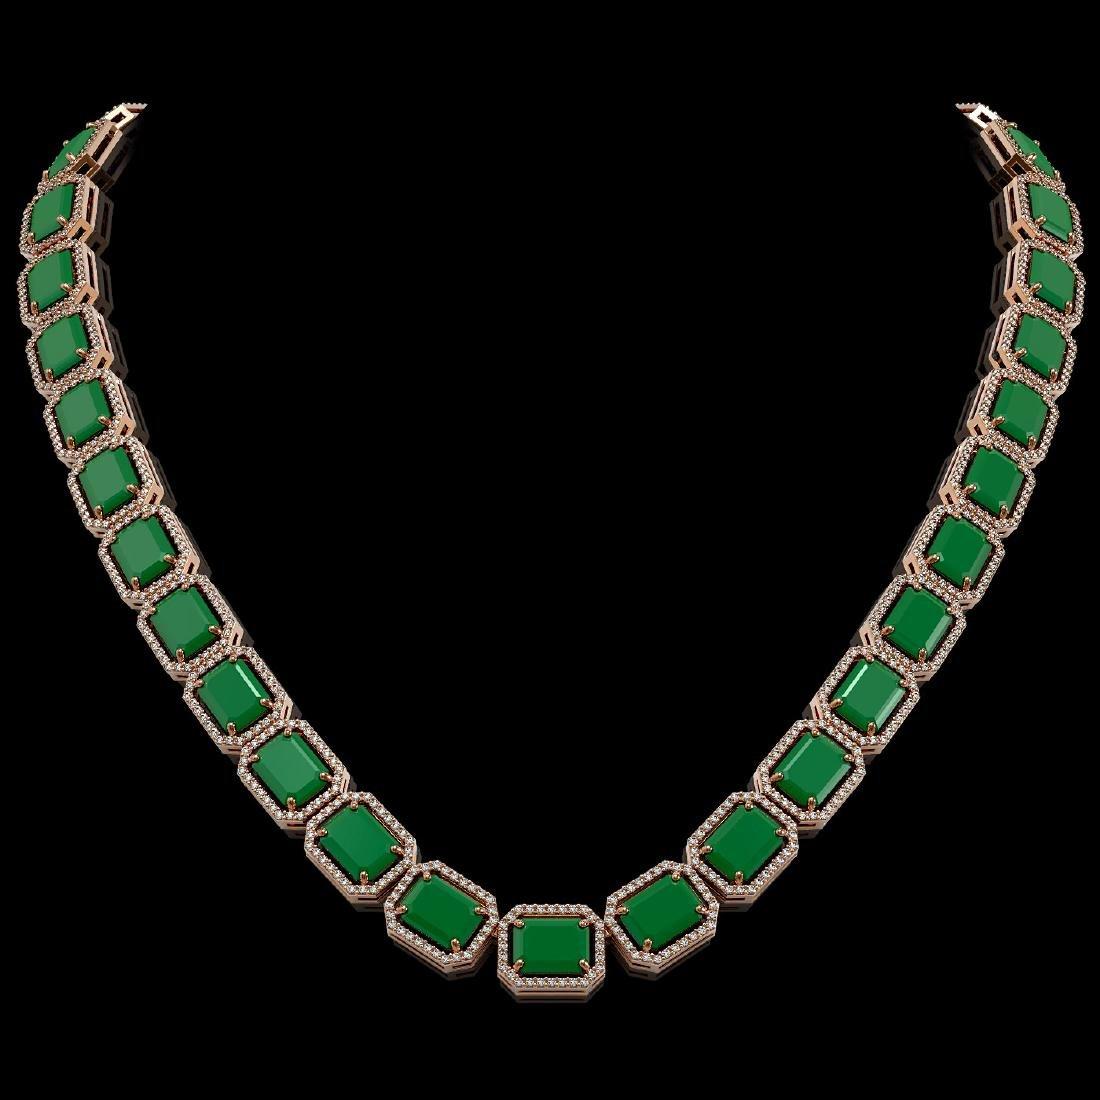 84.94 CTW Emerald & Diamond Halo Necklace 10K Rose Gold